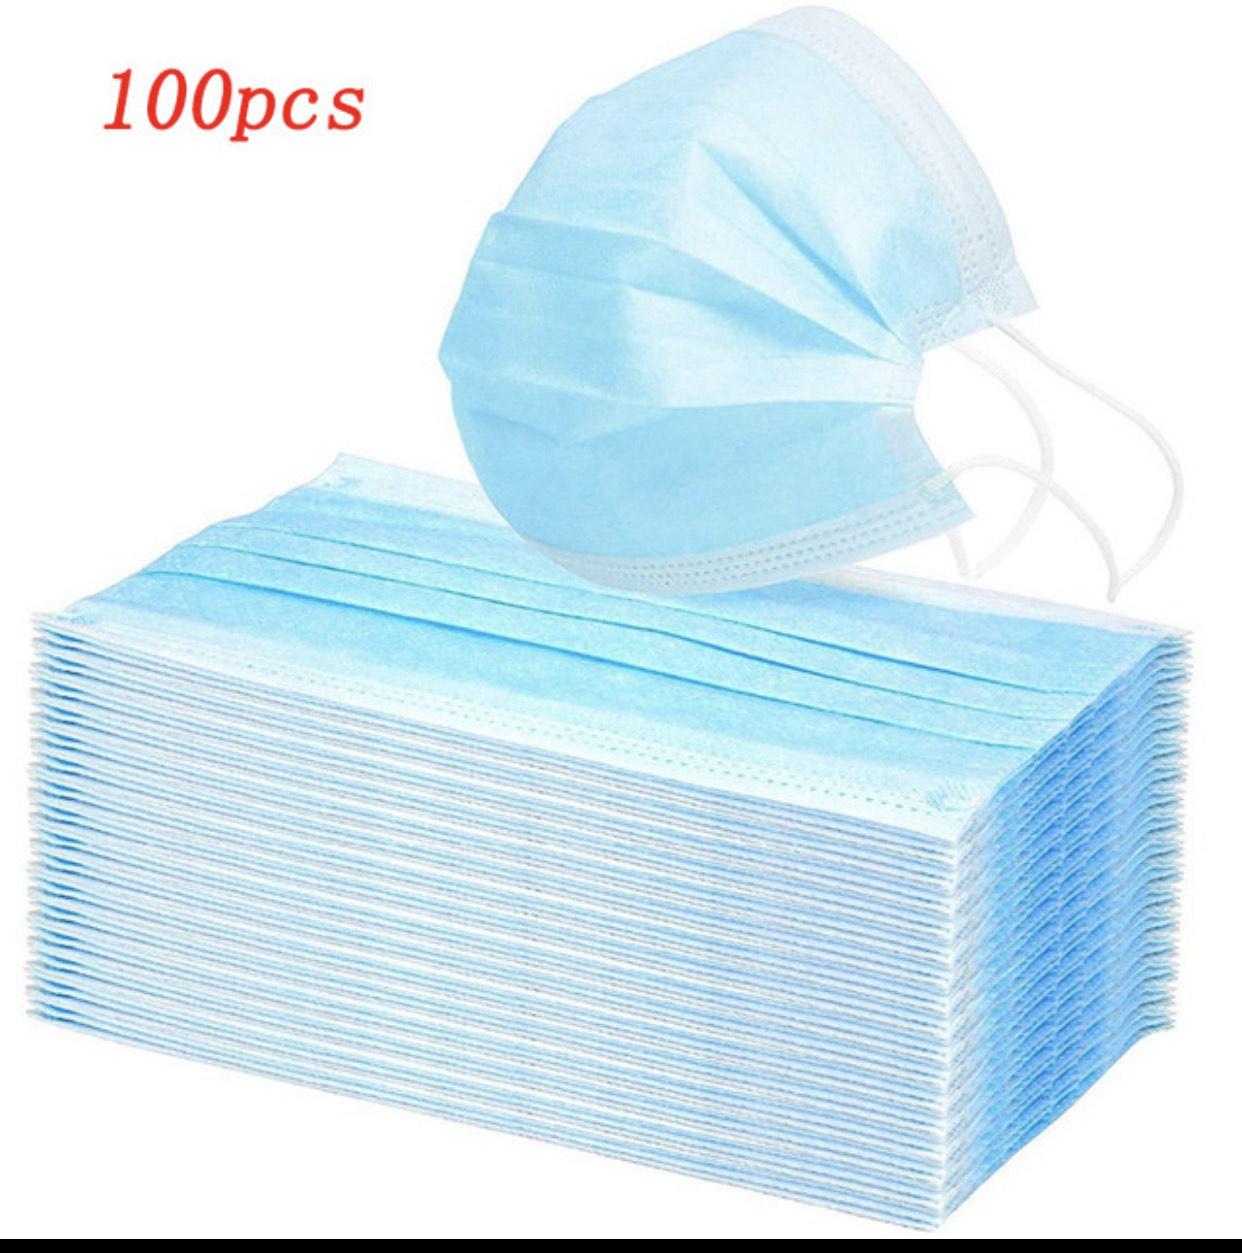 Mascarillas pack 100 unidades